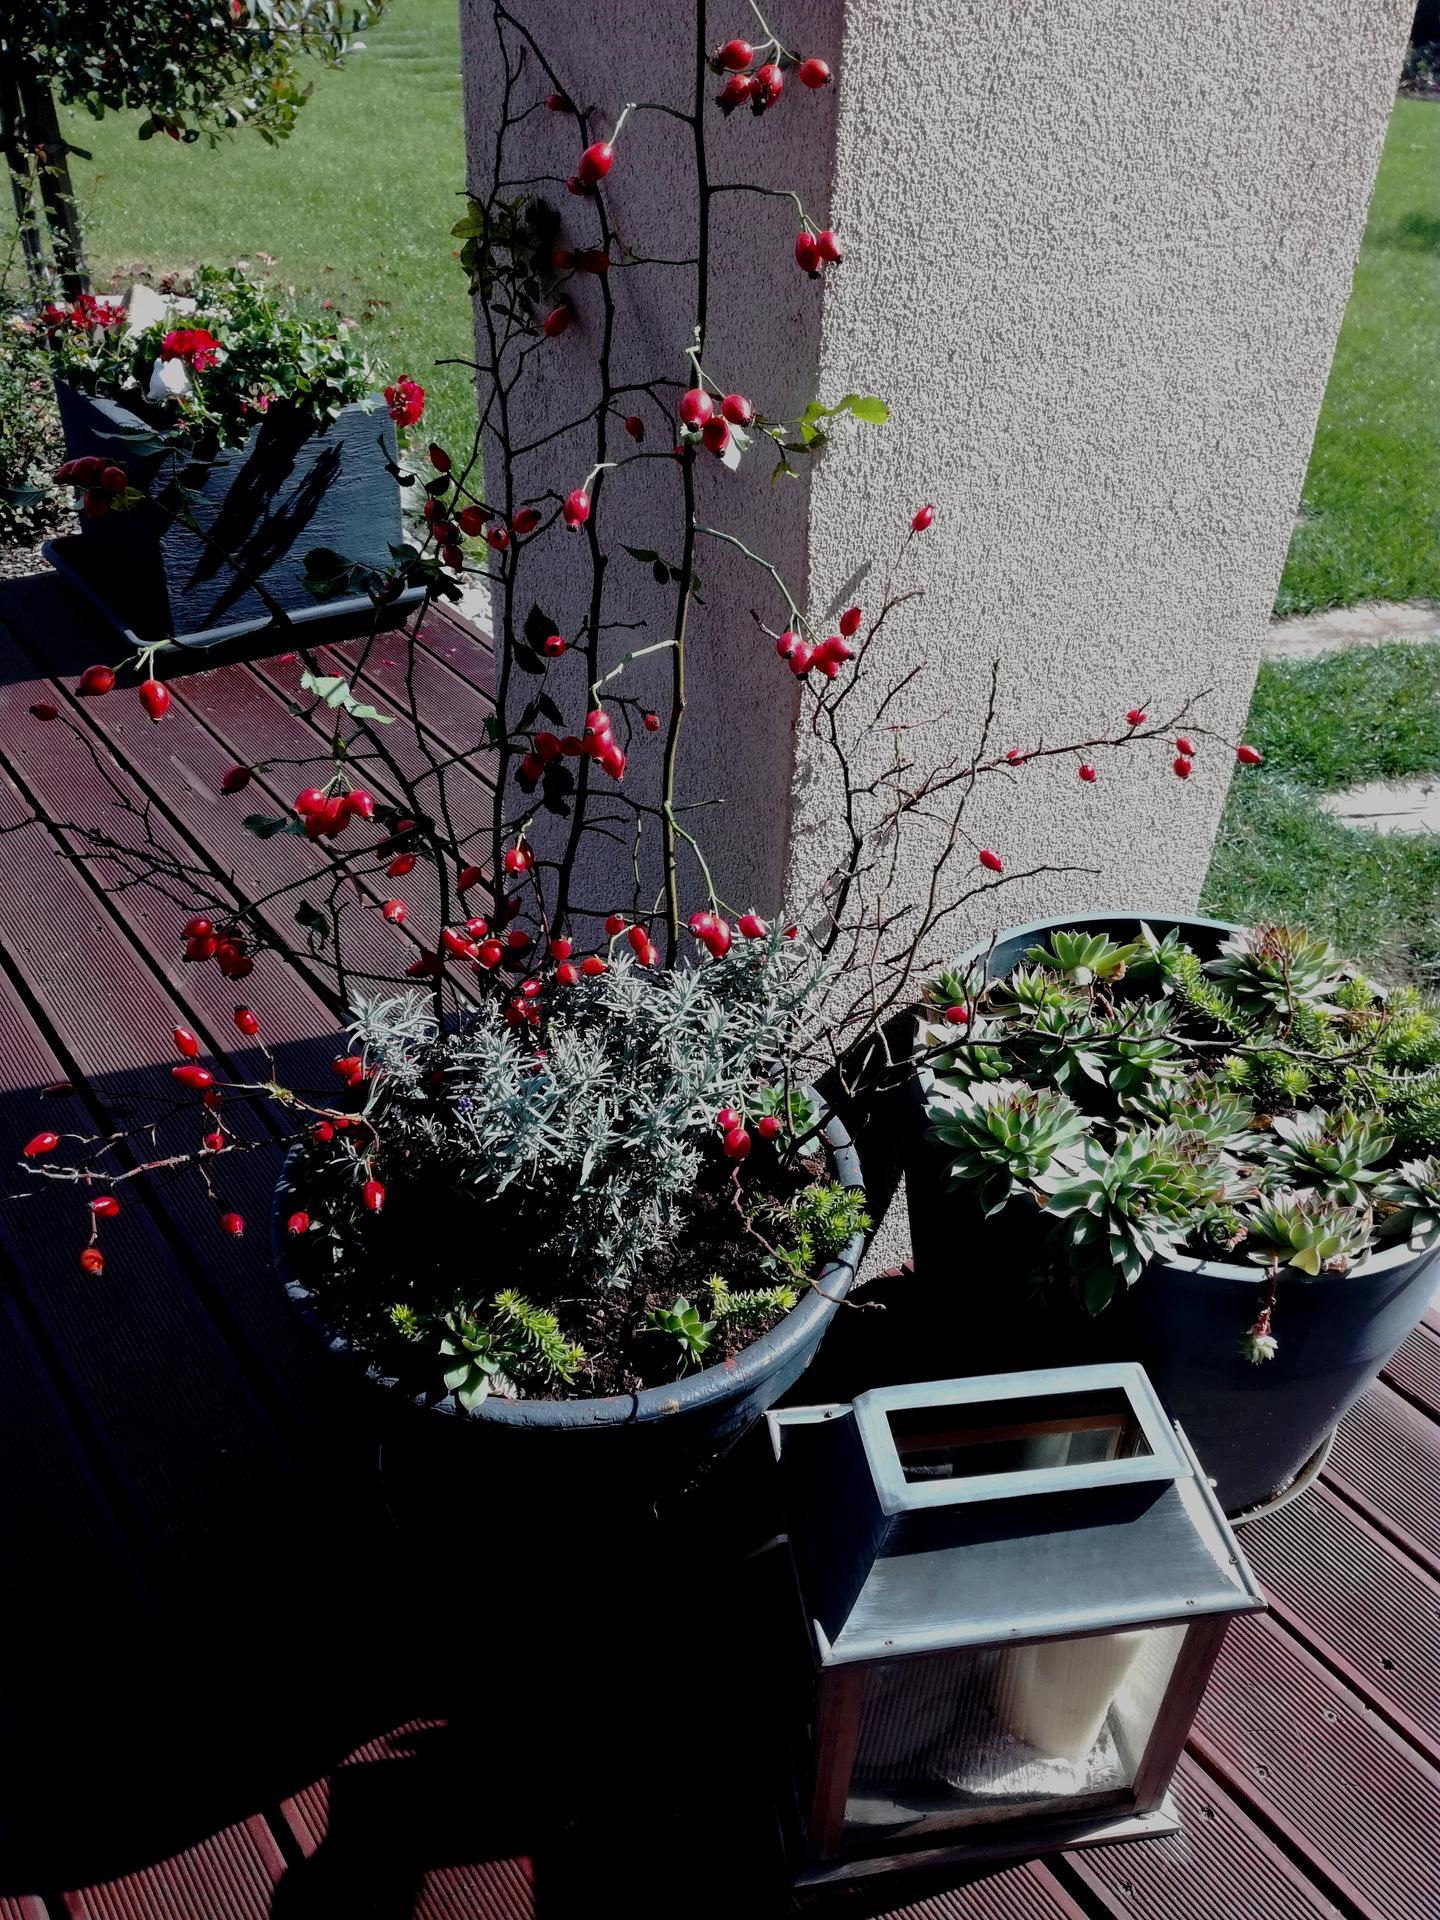 Zahrada 2021 🌲 - Obrázek č. 203